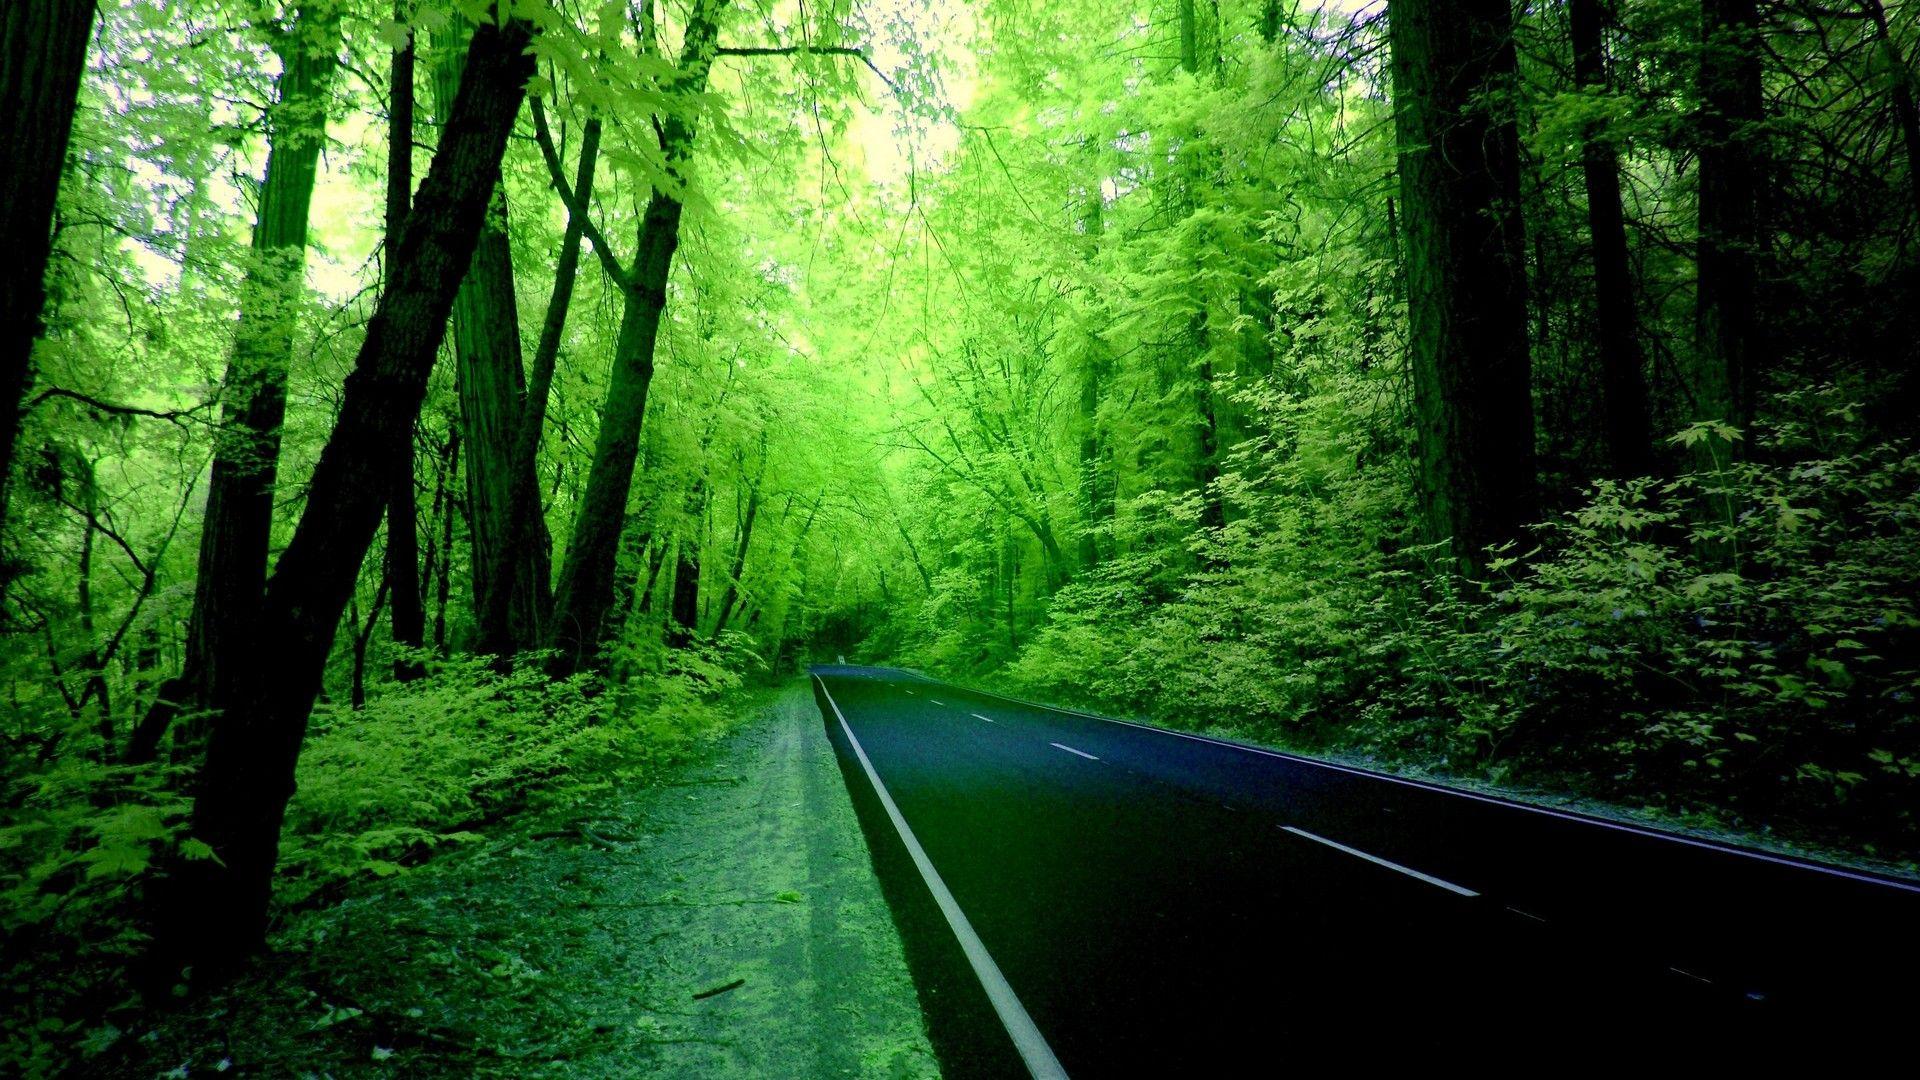 Computer Wallpapers Nature Green Best Wallpaper Hd Desktop Background Nature Nature Desktop Greenery Wallpaper